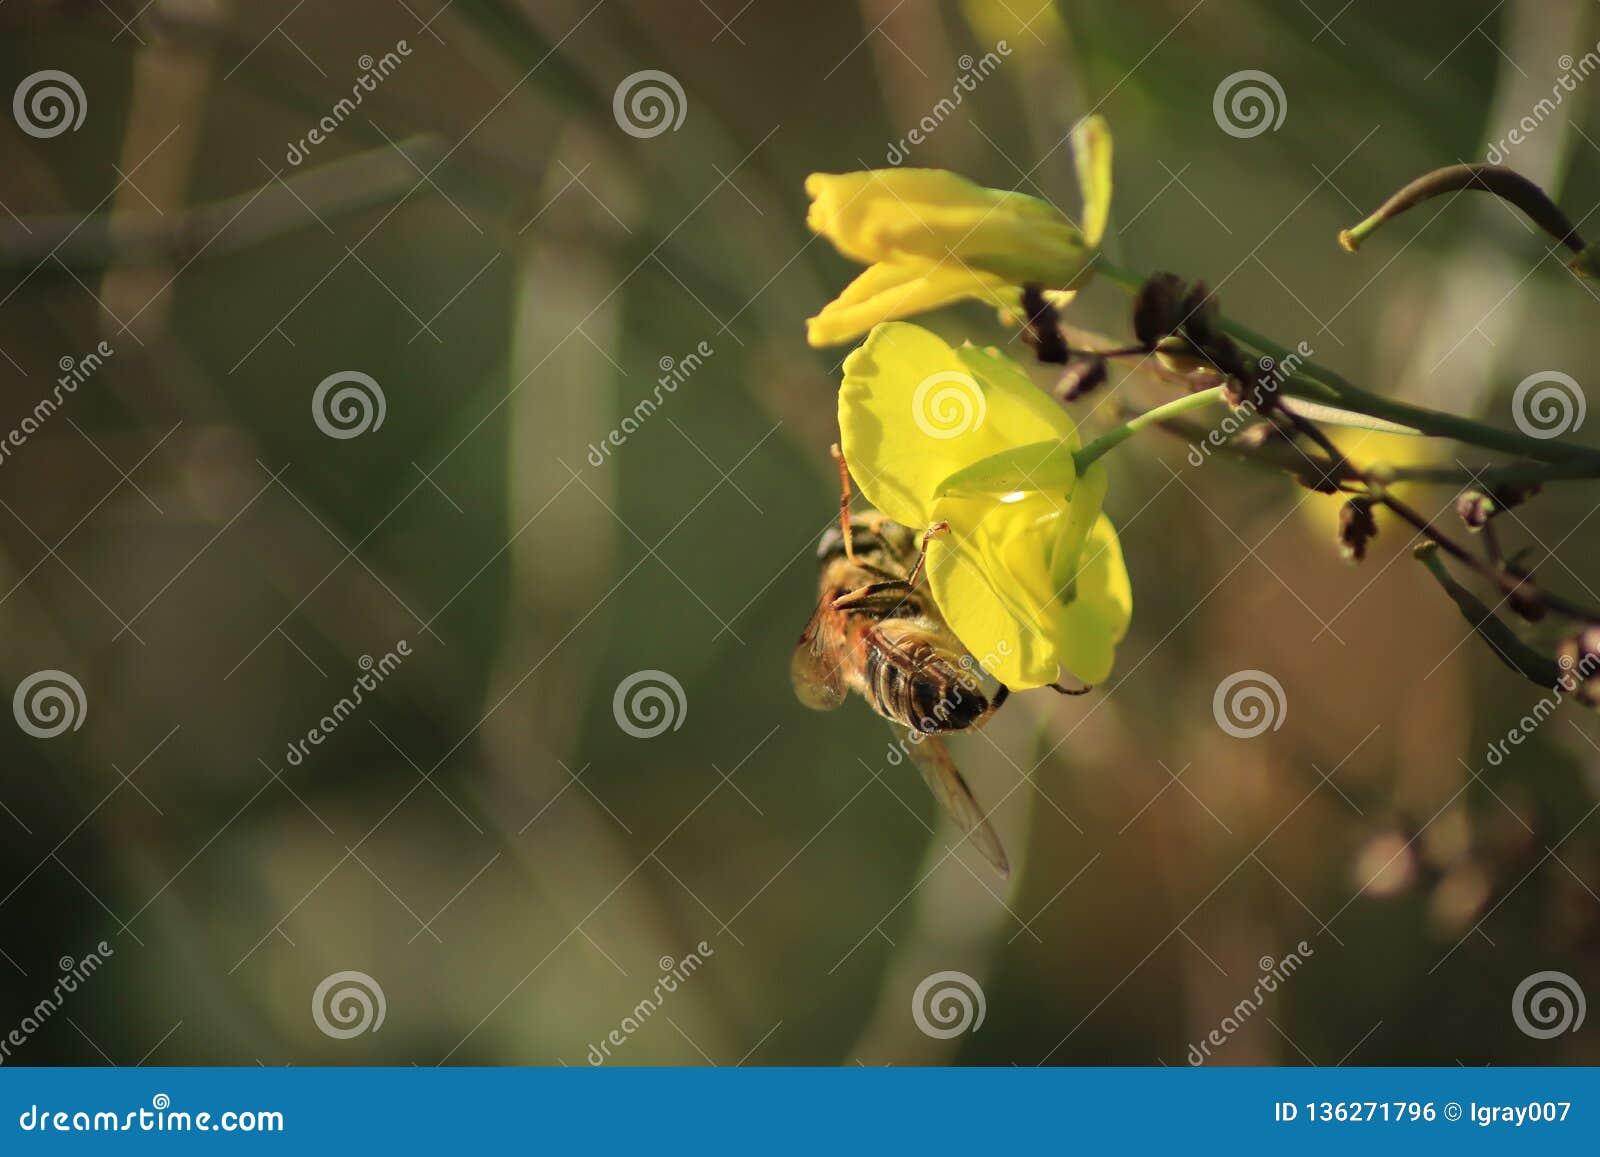 Bee on a winter cress. Yellow flower closeup on dark background.